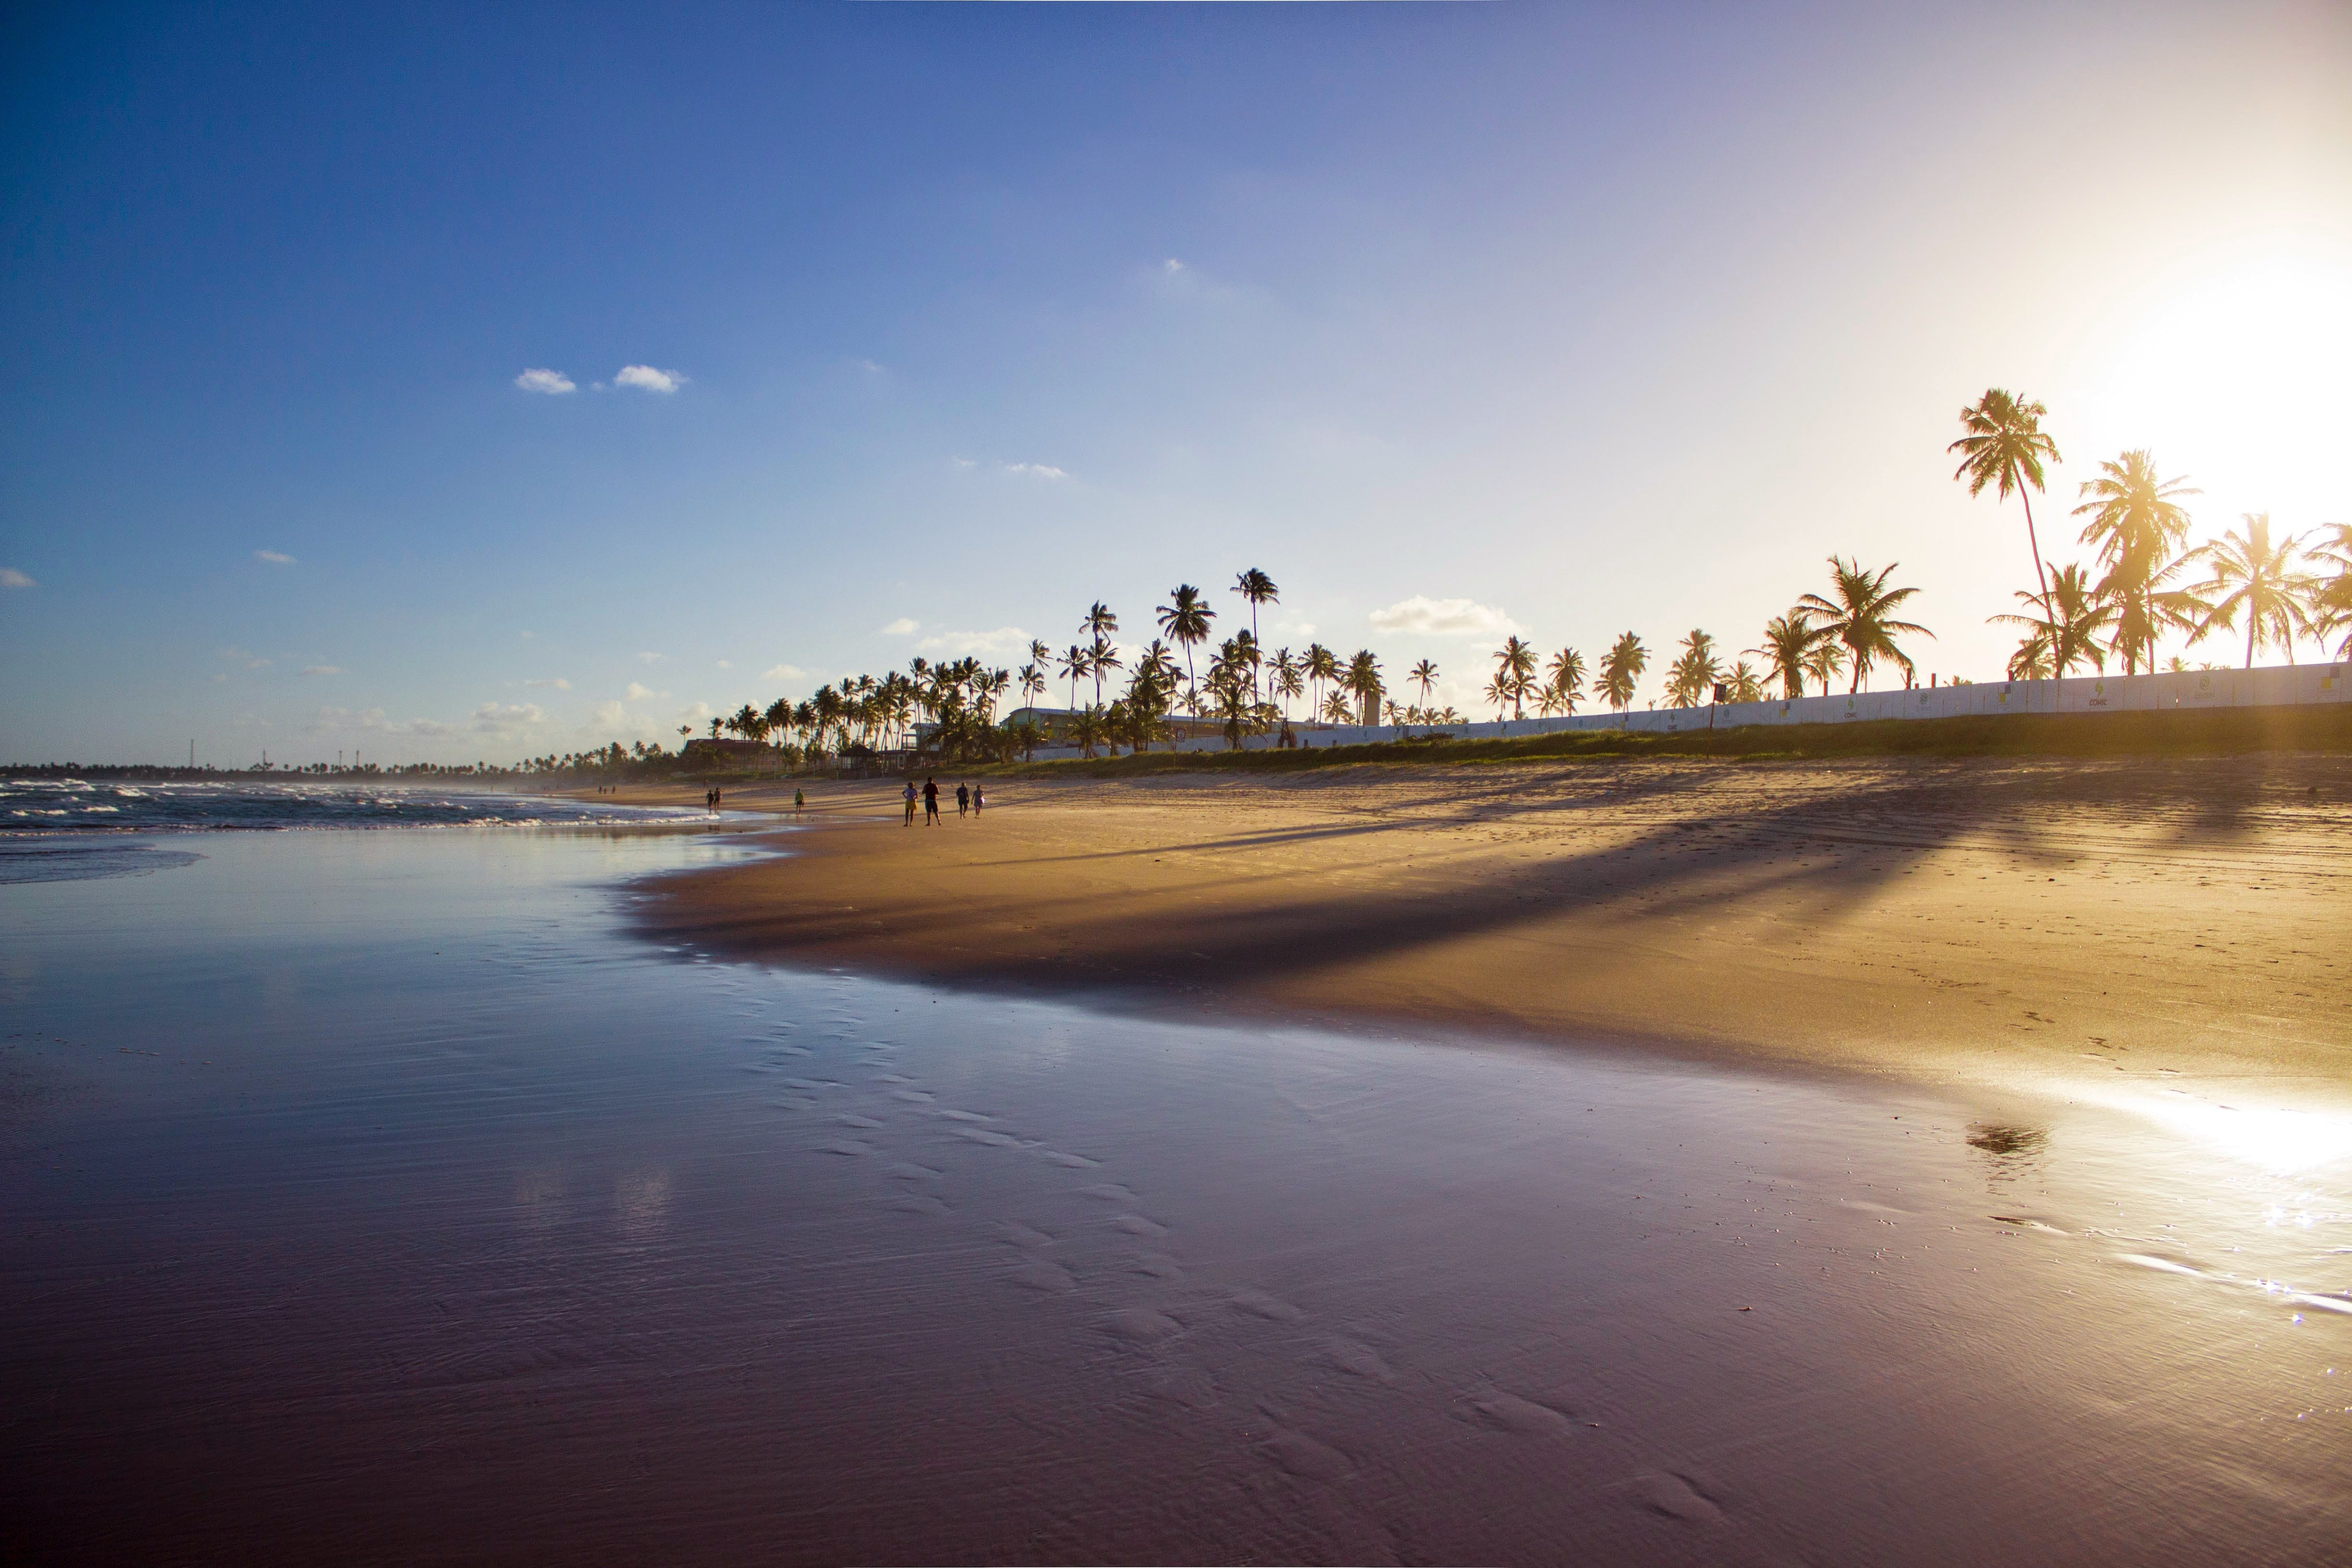 Free stock photo of beach, blue sky, brazil, coconut